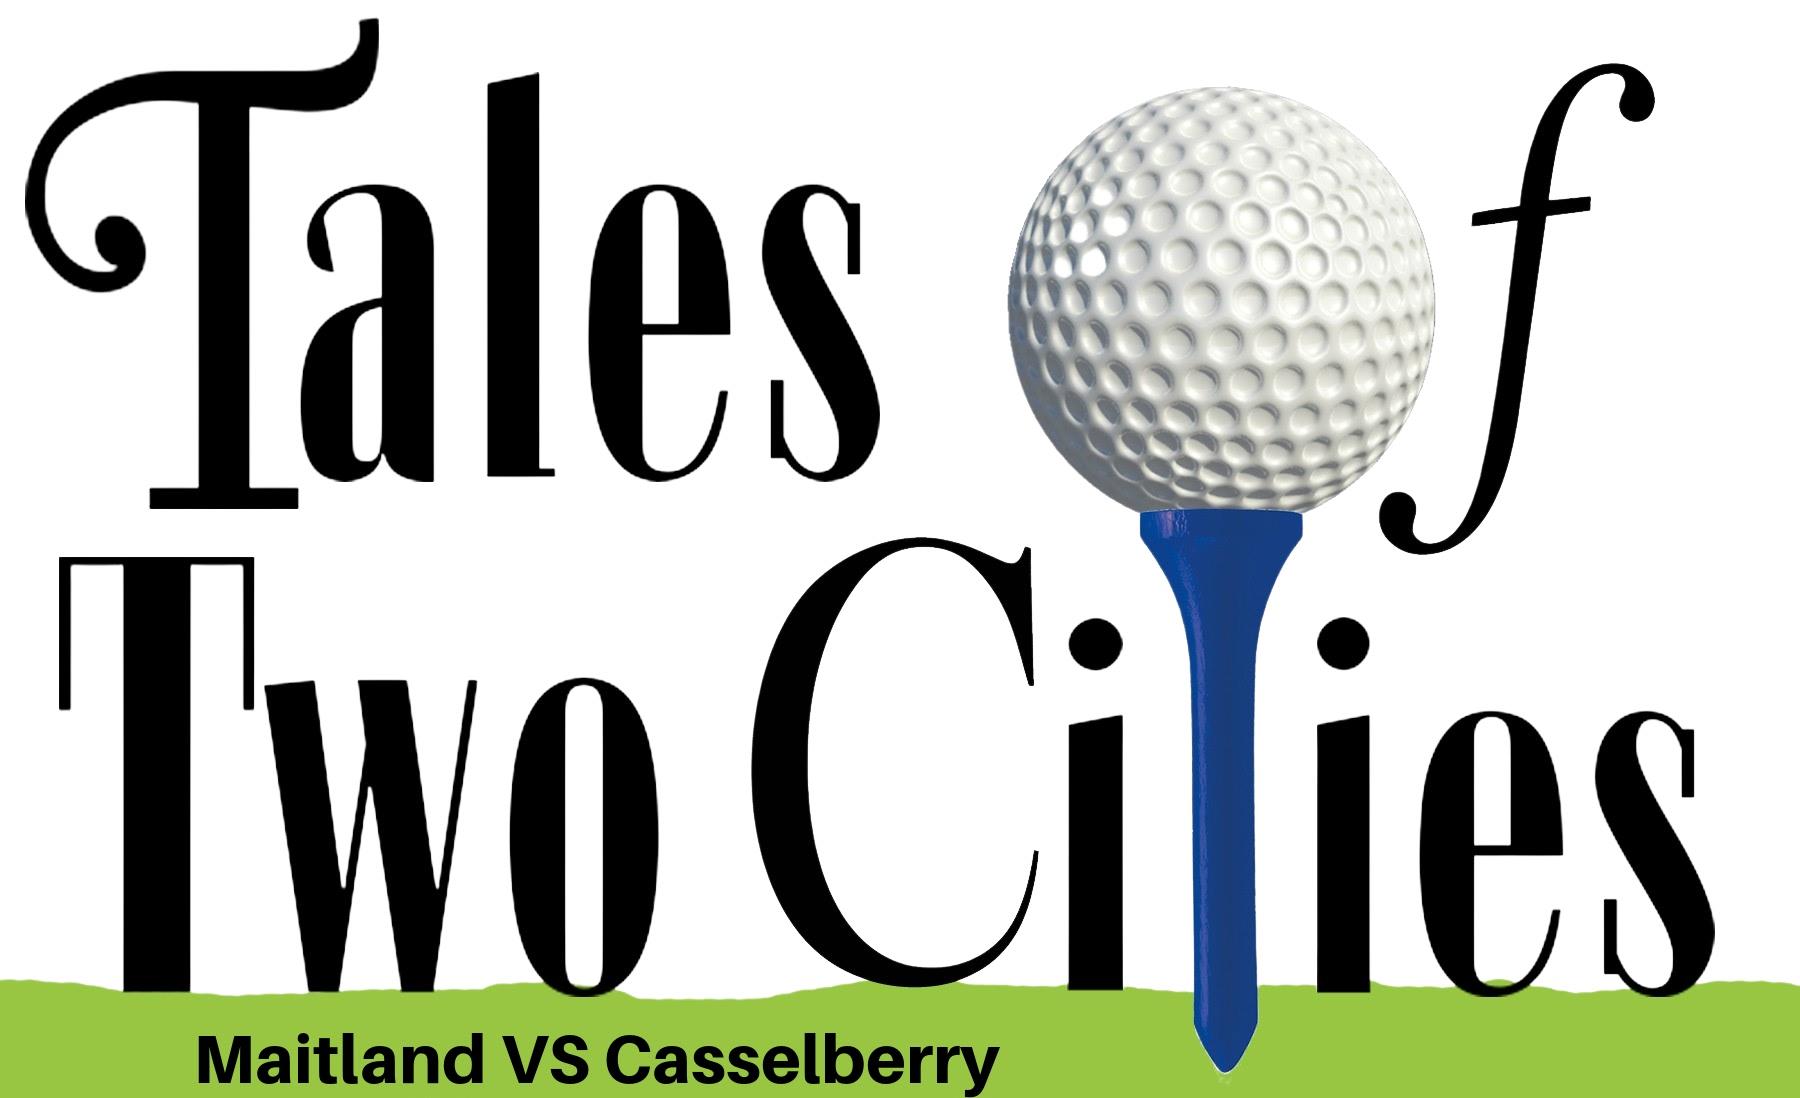 Golf Etiquette at Work.....